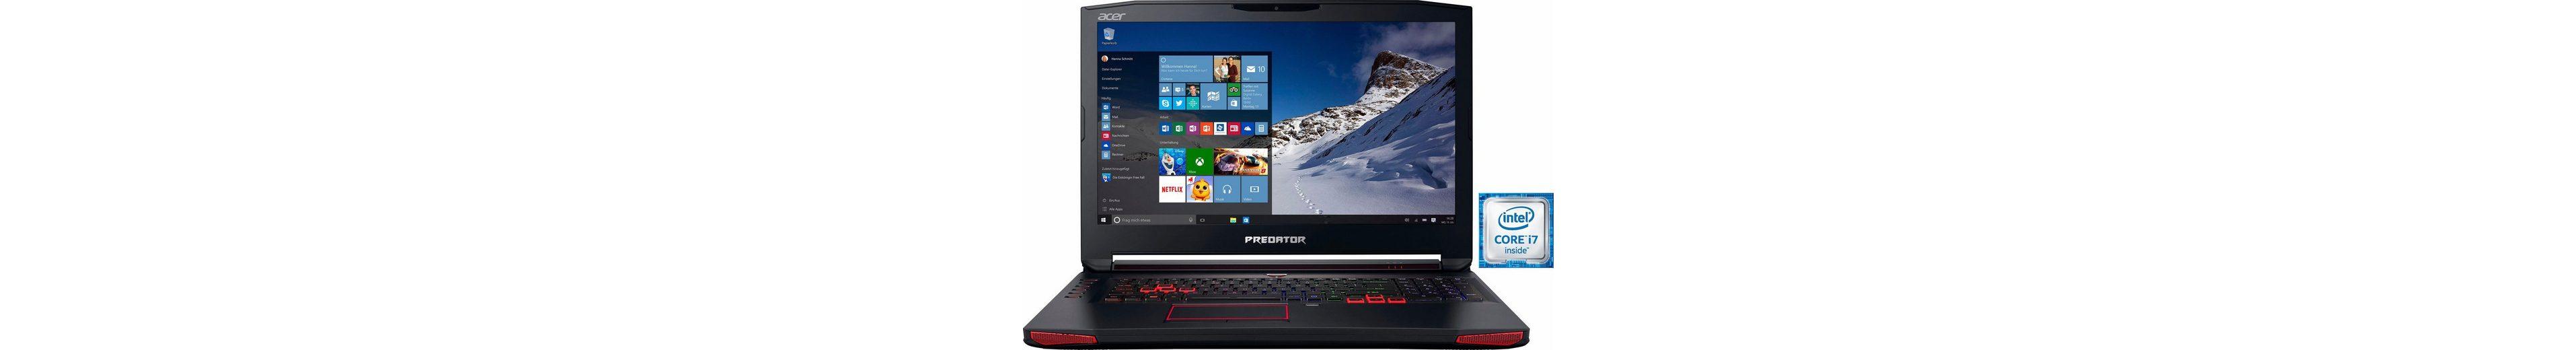 Acer Predator 17 (G9-793-72AT) Notebook, Intel® Core™ i7, 43,9 cm (17,3 Zoll), 1512 GB Speicher